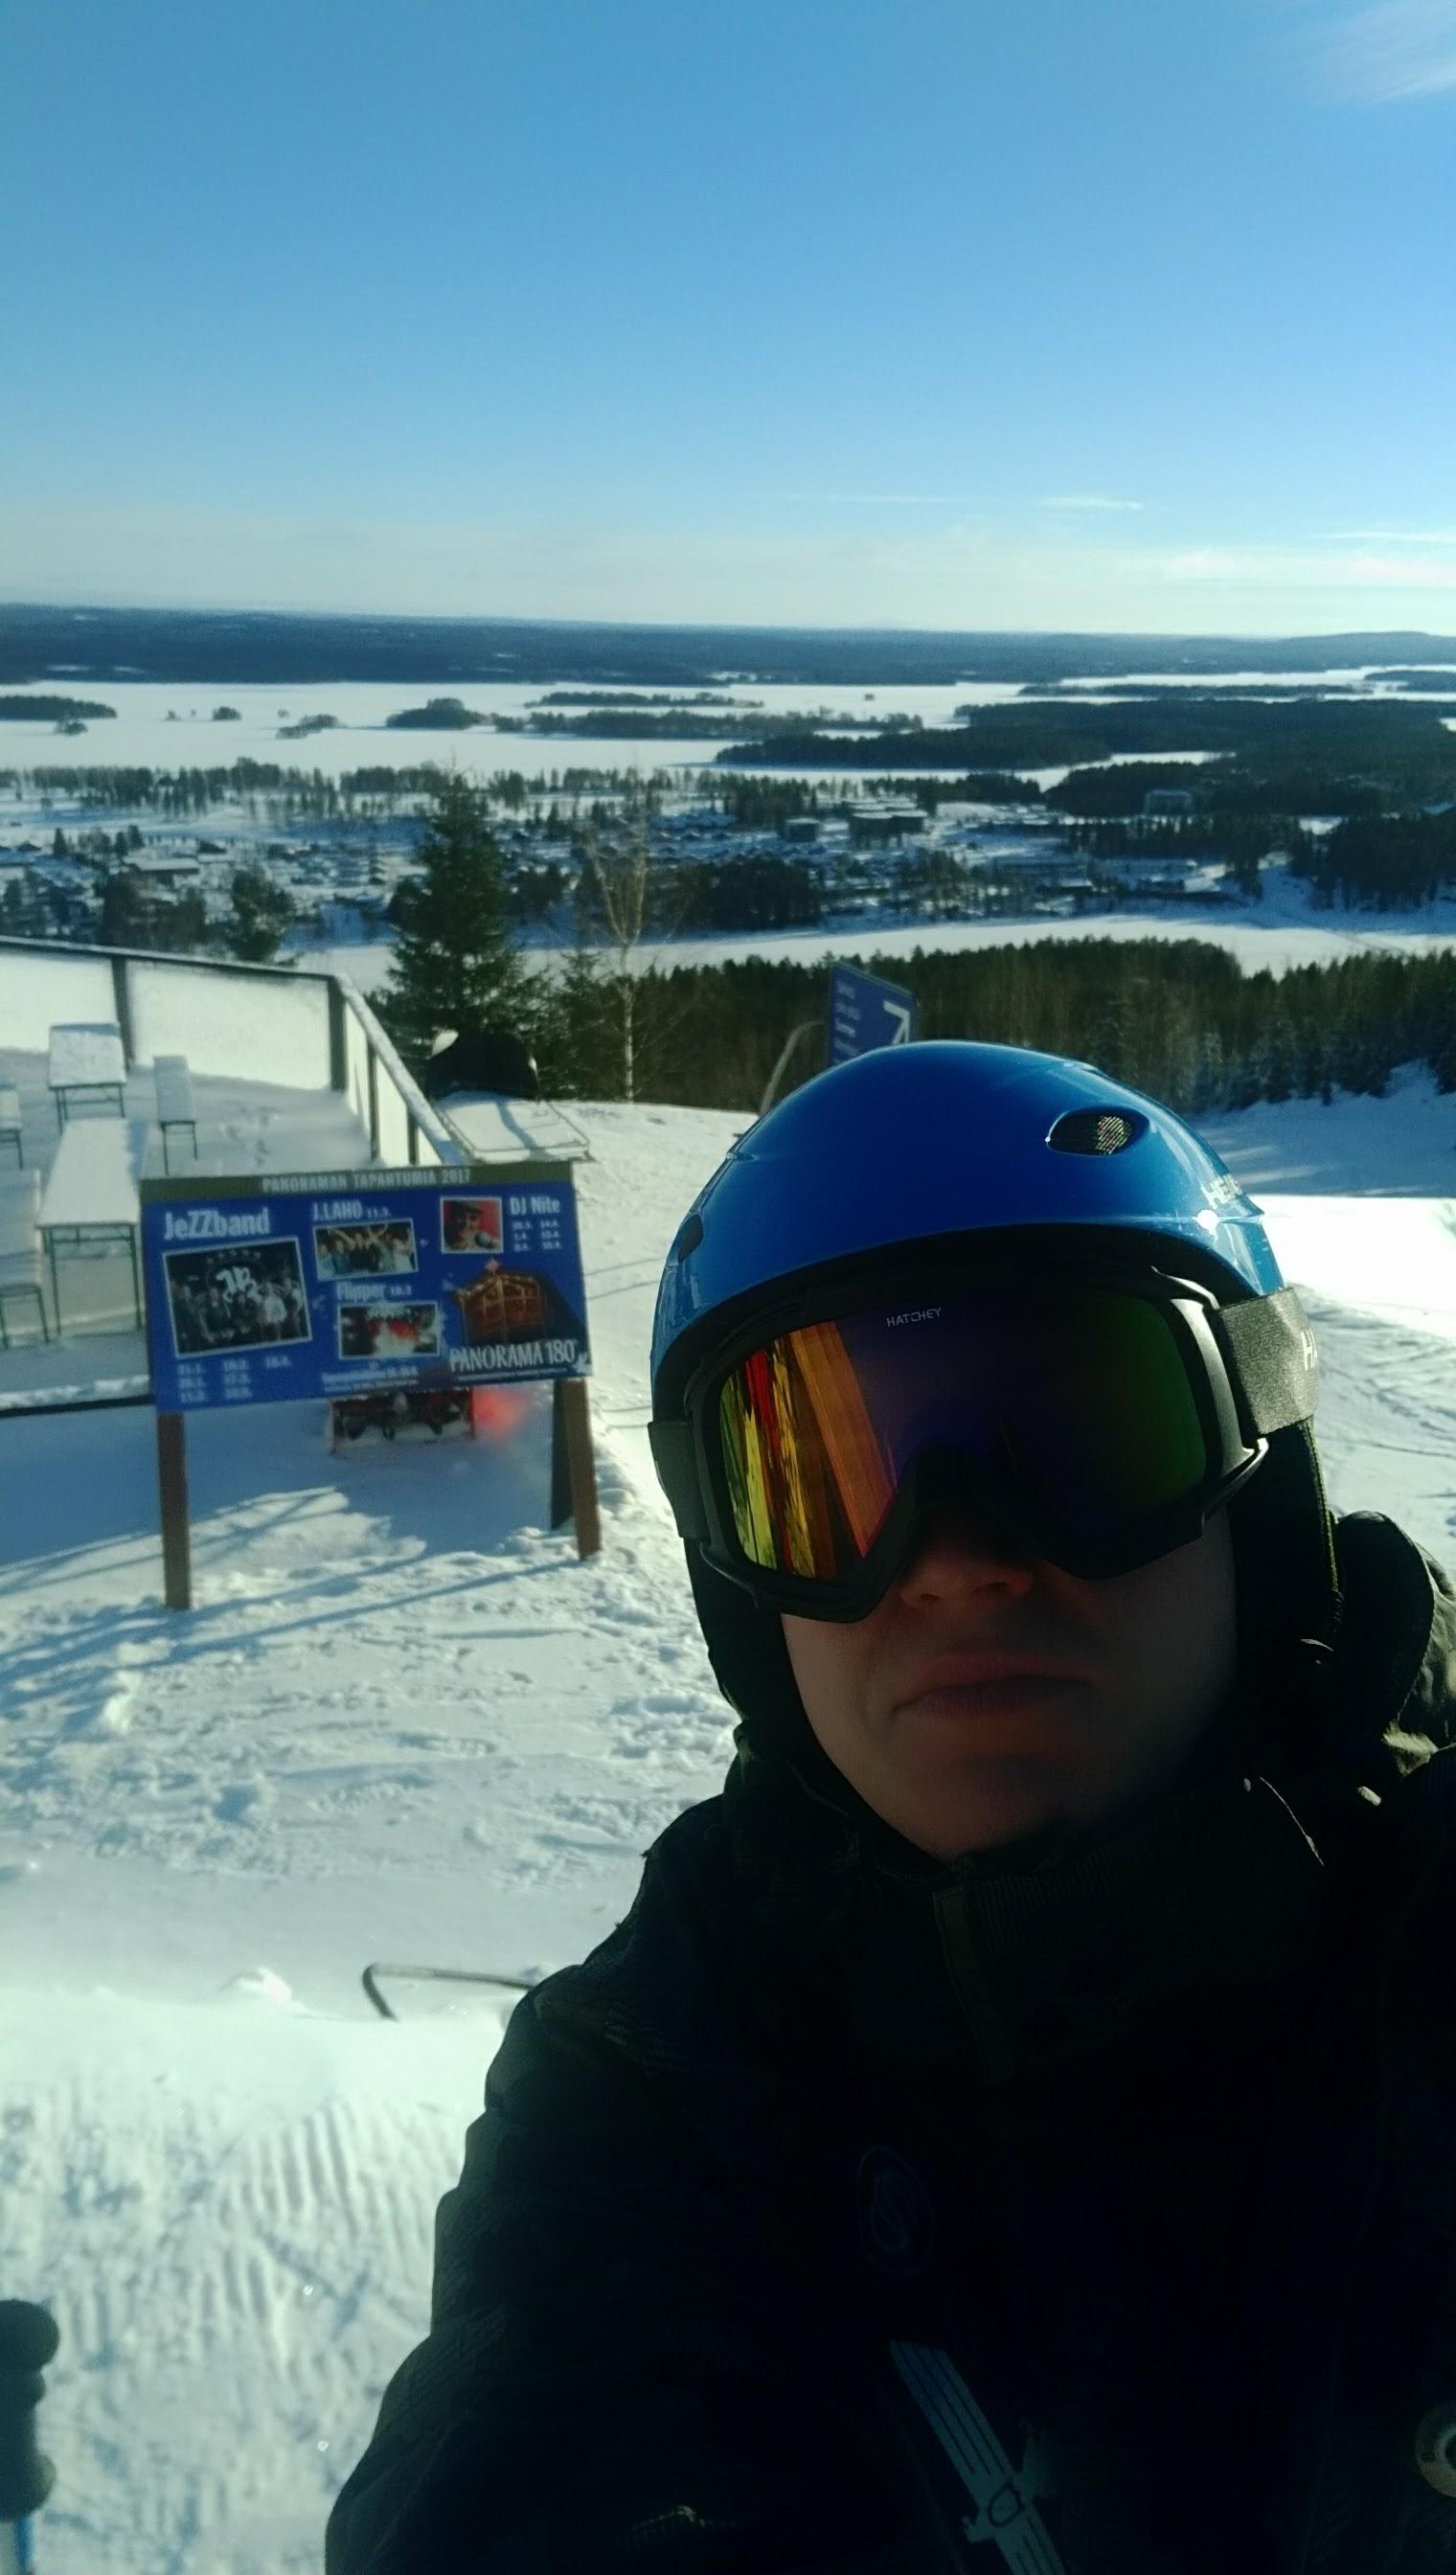 Mäesport Olaf